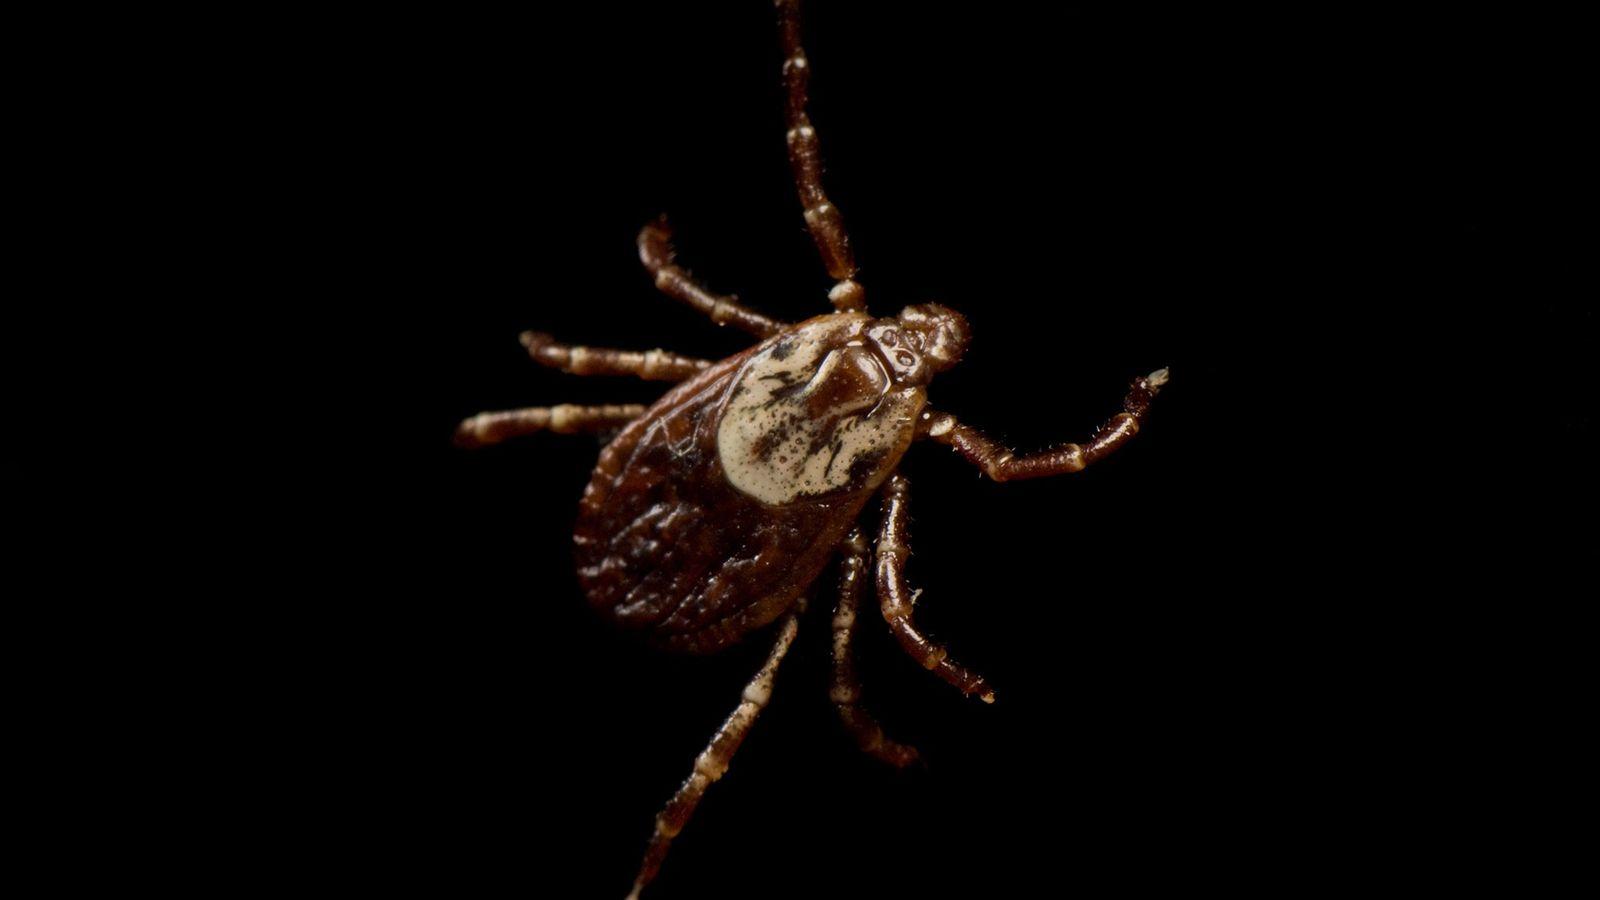 Garrapata Dermacentor variabilis